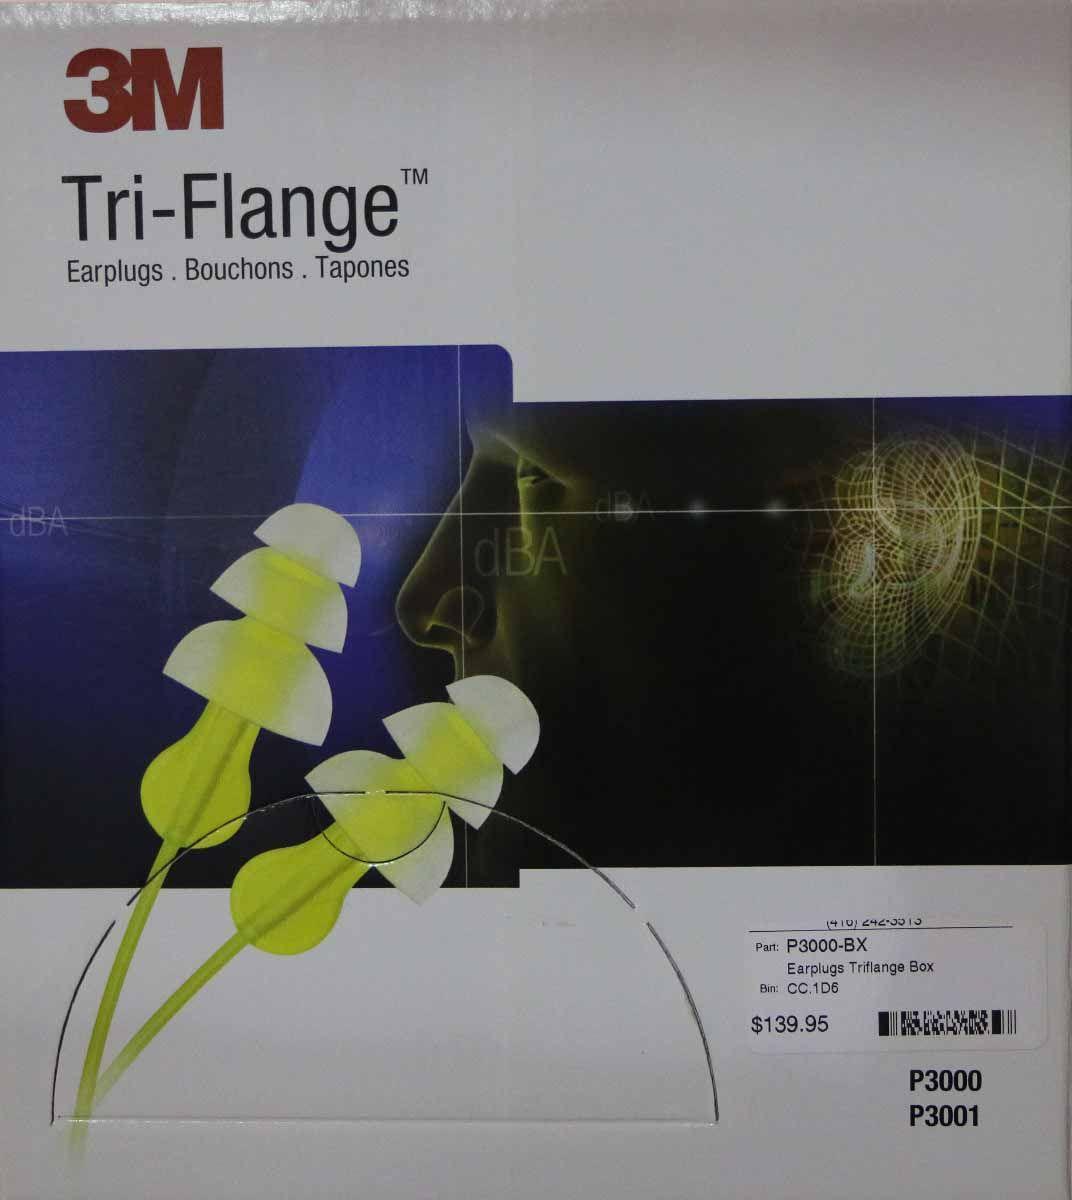 3M Tri-Flange Corded Ear Plug